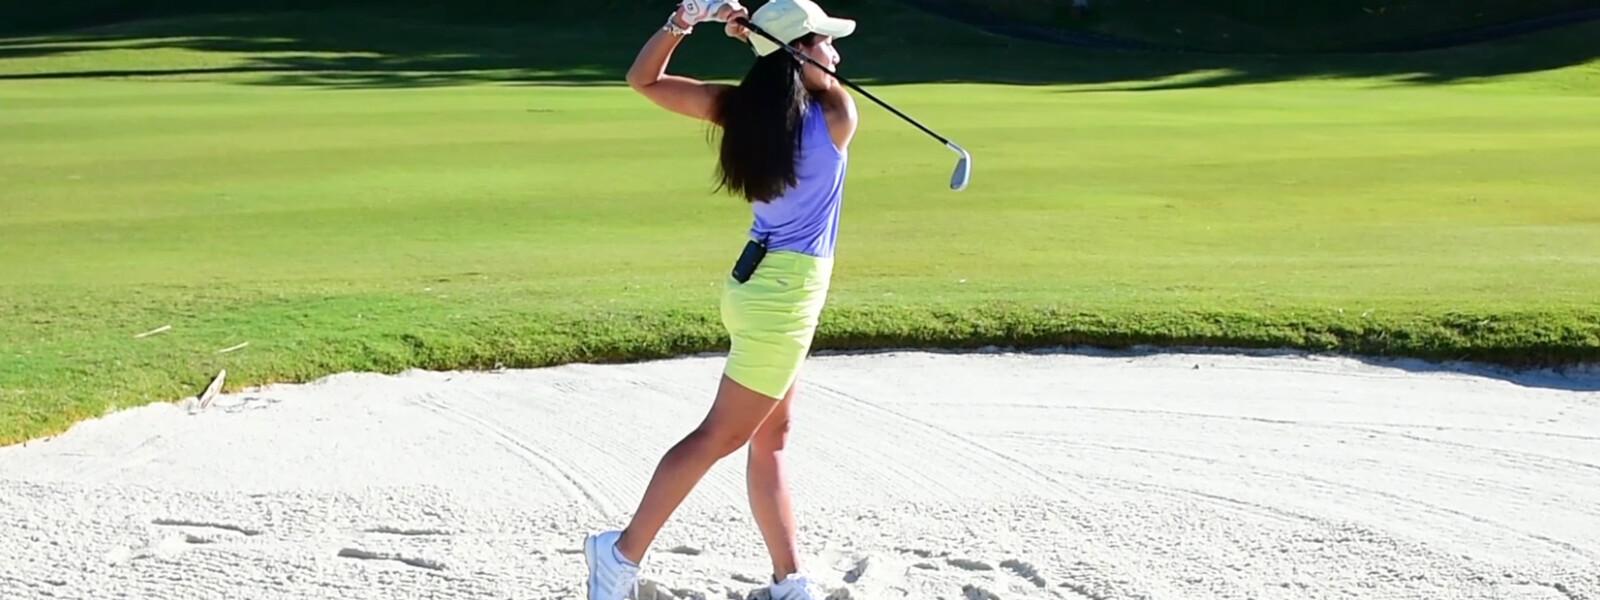 2. Golf-Trainingsvideo: Fairway Bunker